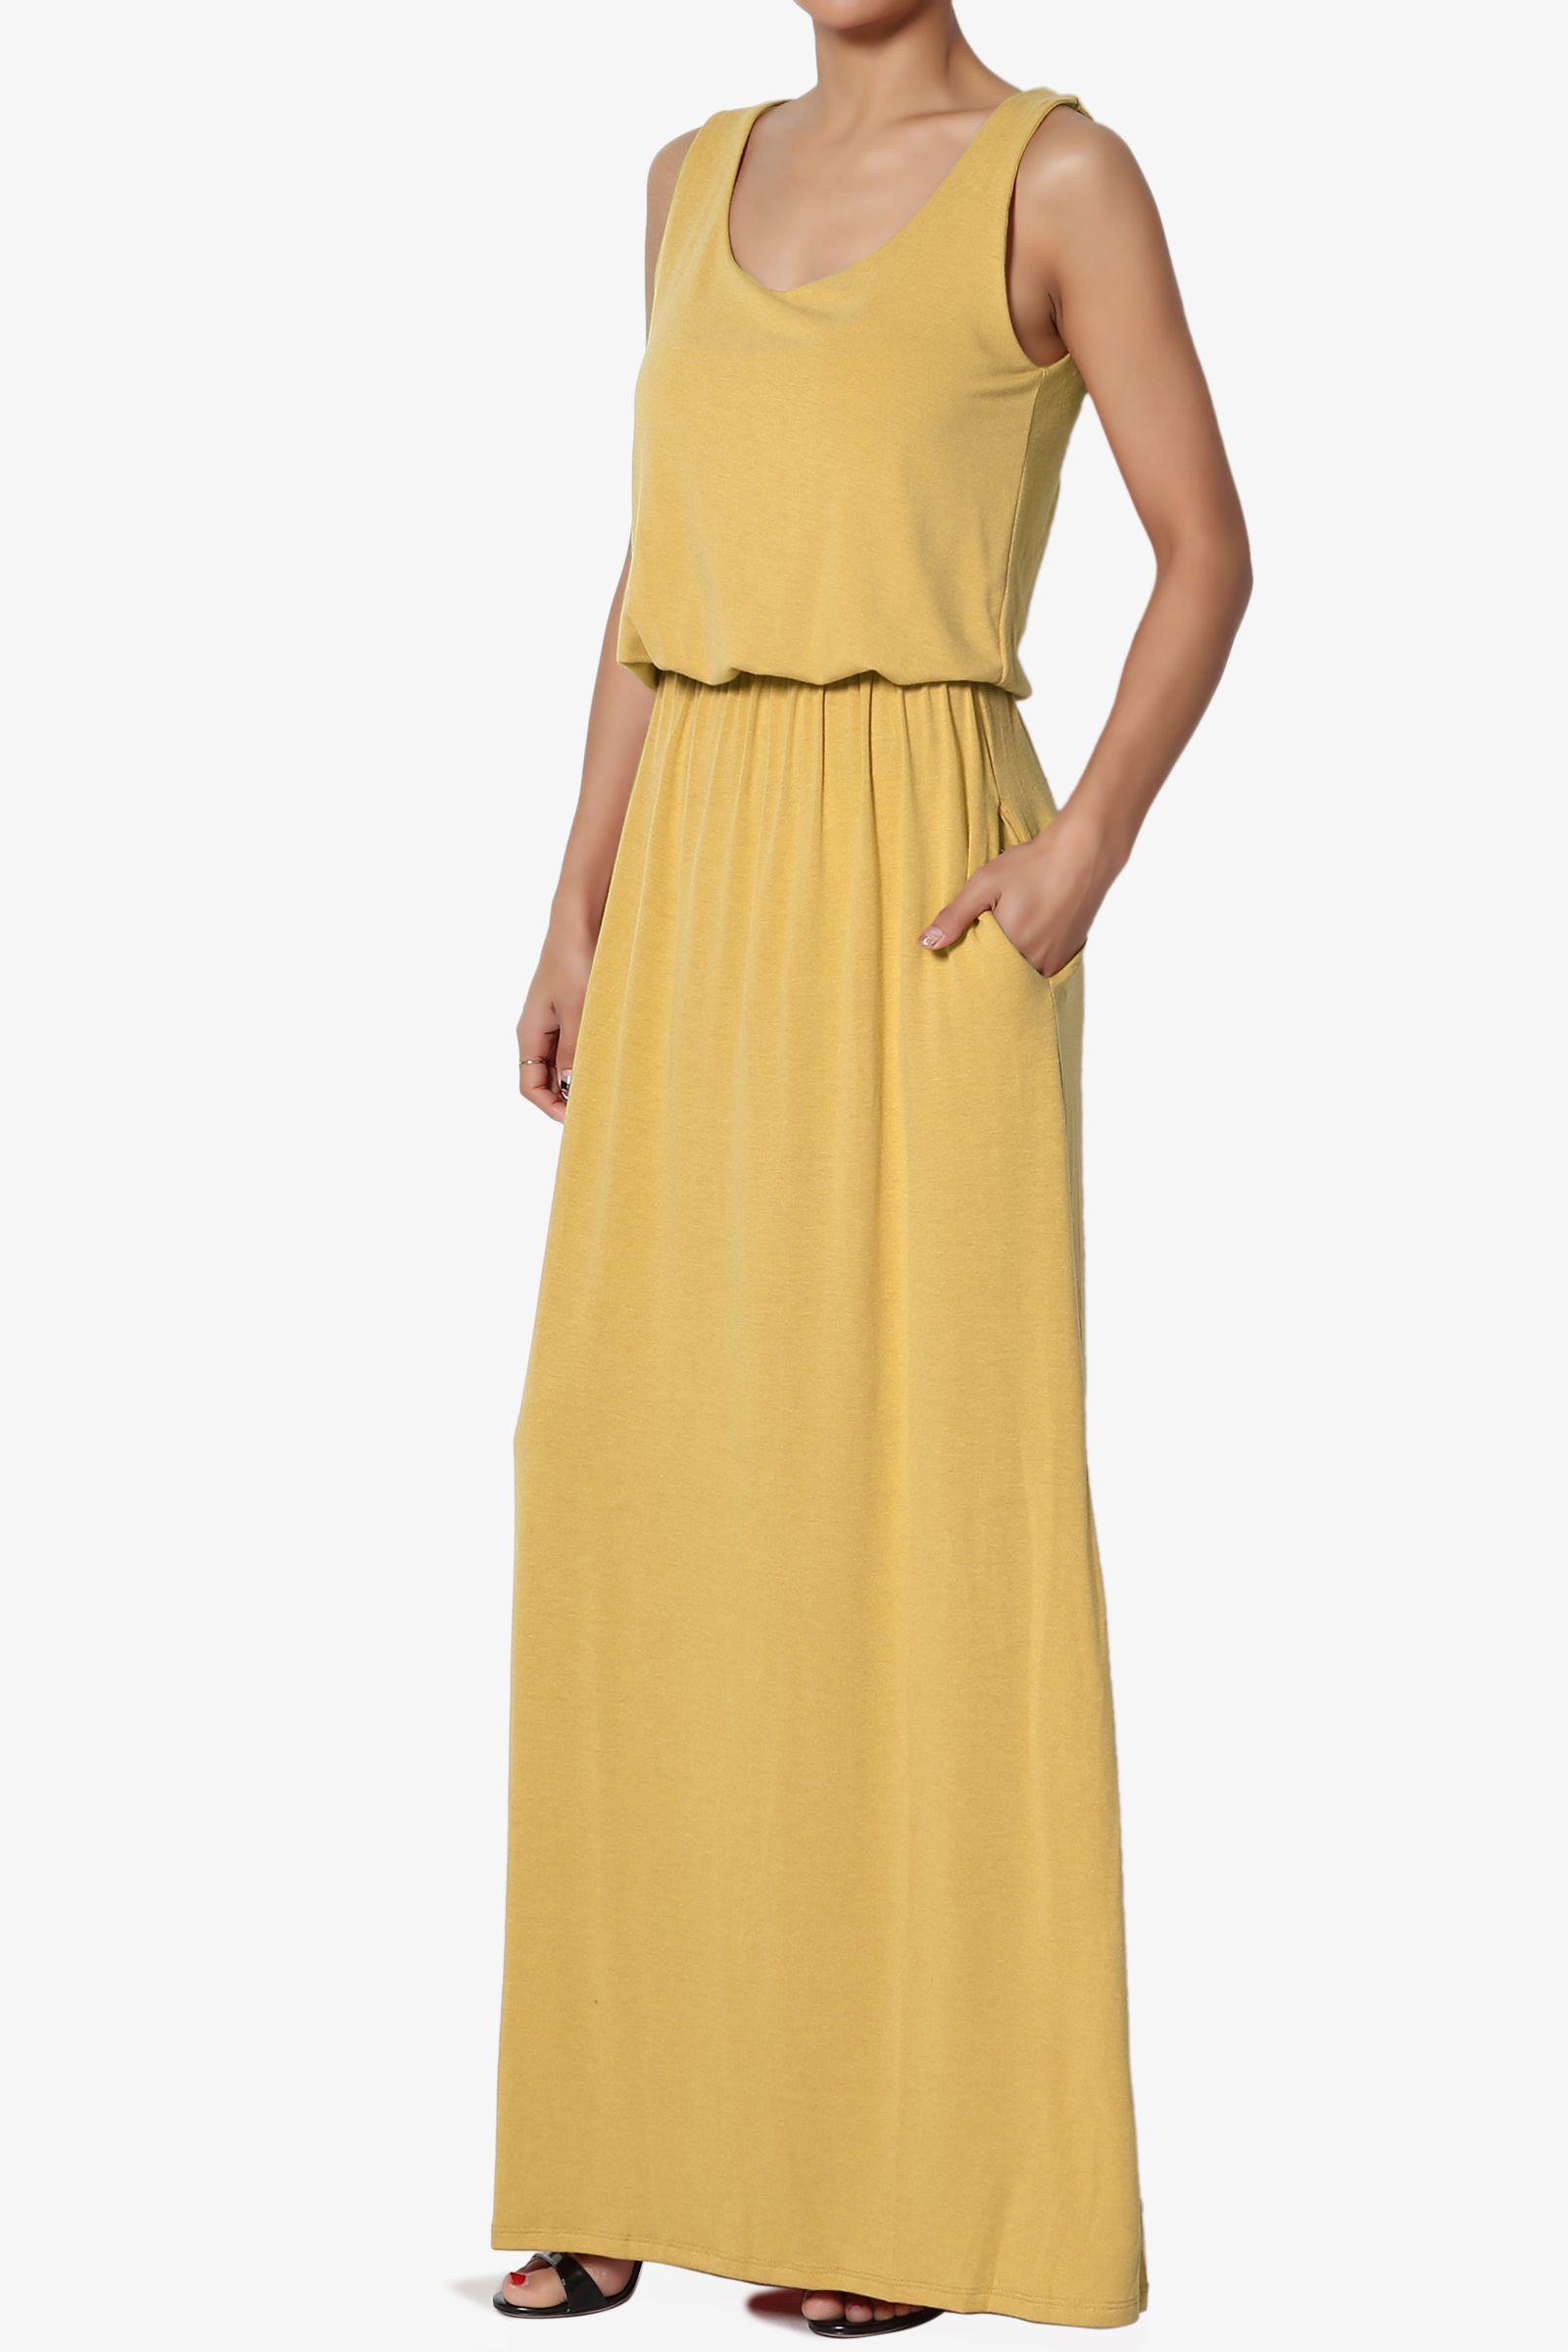 Themogan Themogan Women S S 3x Sleeveless Scoop Neck Blouson Tank Top Long Skirt Maxi Dress Walmart Com Maxi Dress Long Skirt Sleeveless Maxi Dress [ 2400 x 1600 Pixel ]